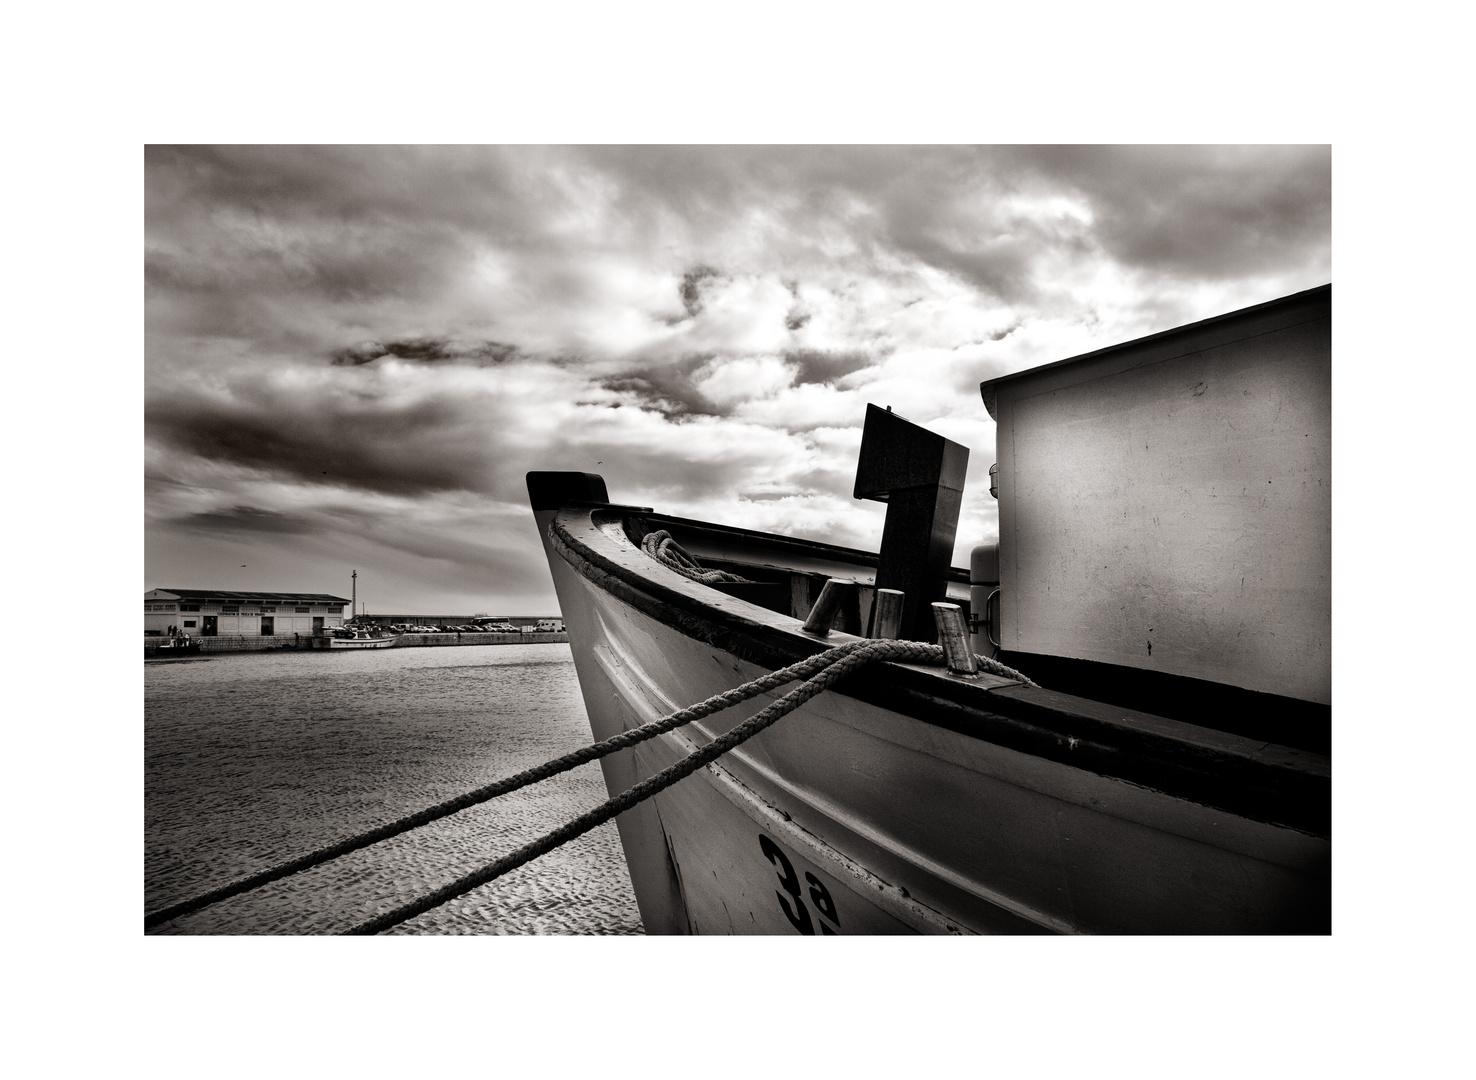 Barca.